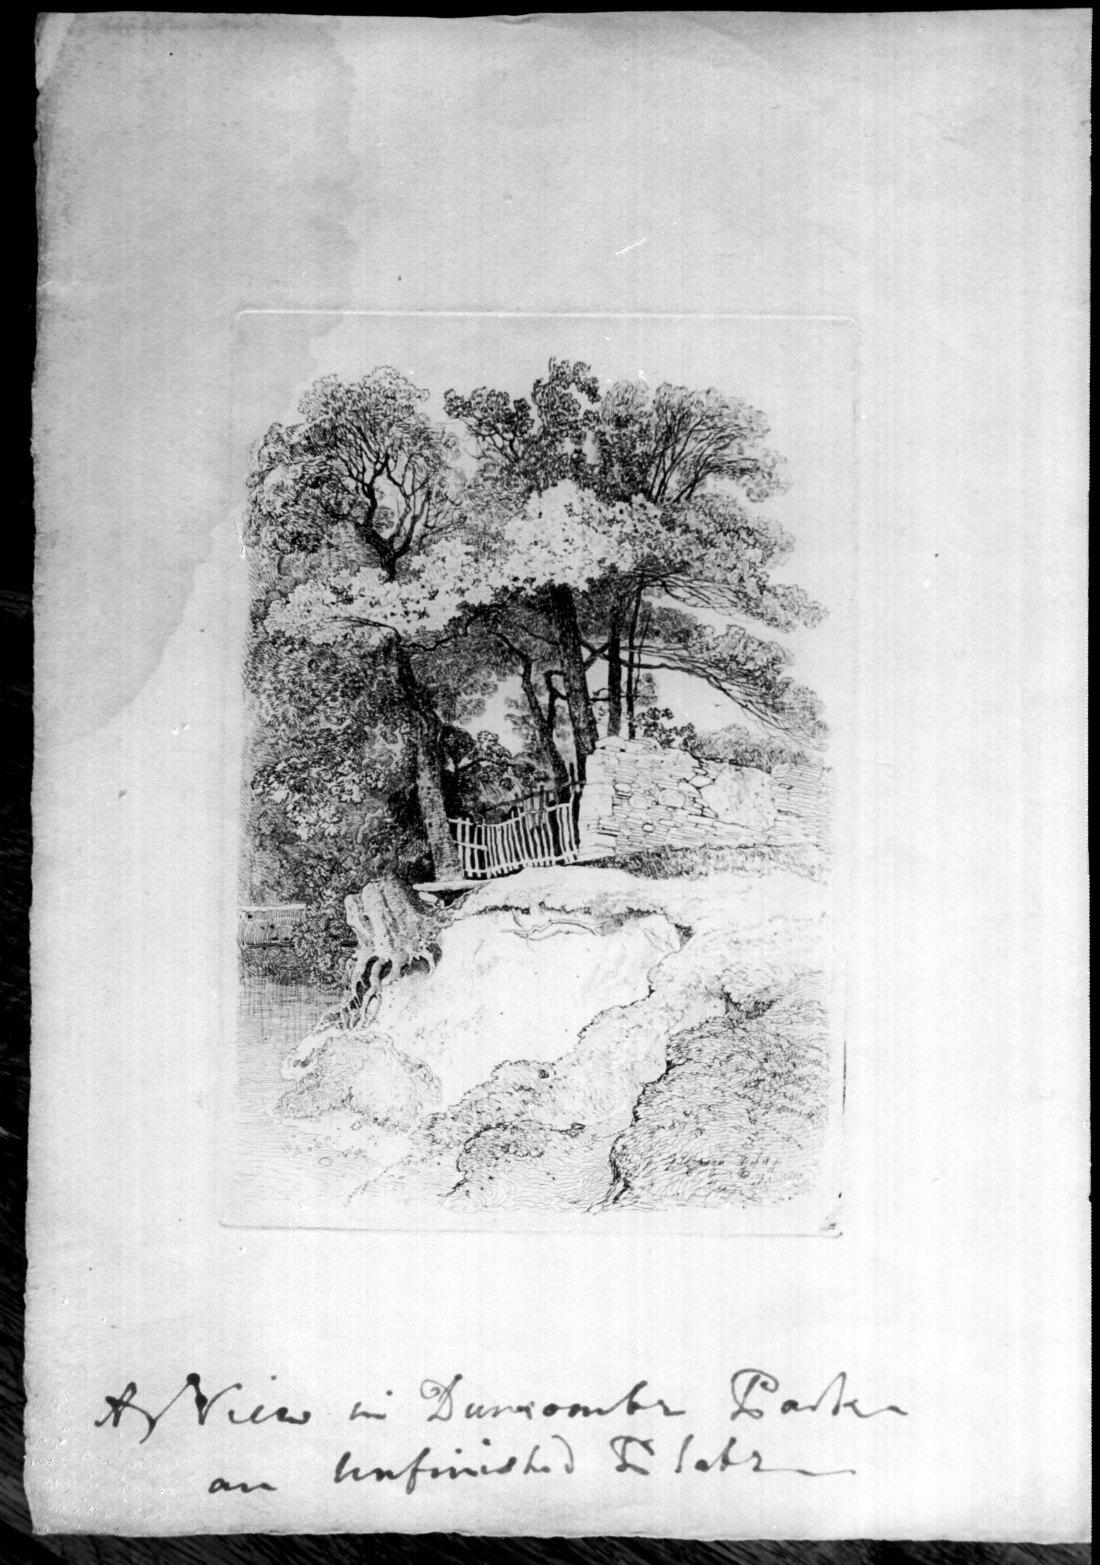 Cholmeley prints - Duncombe Park